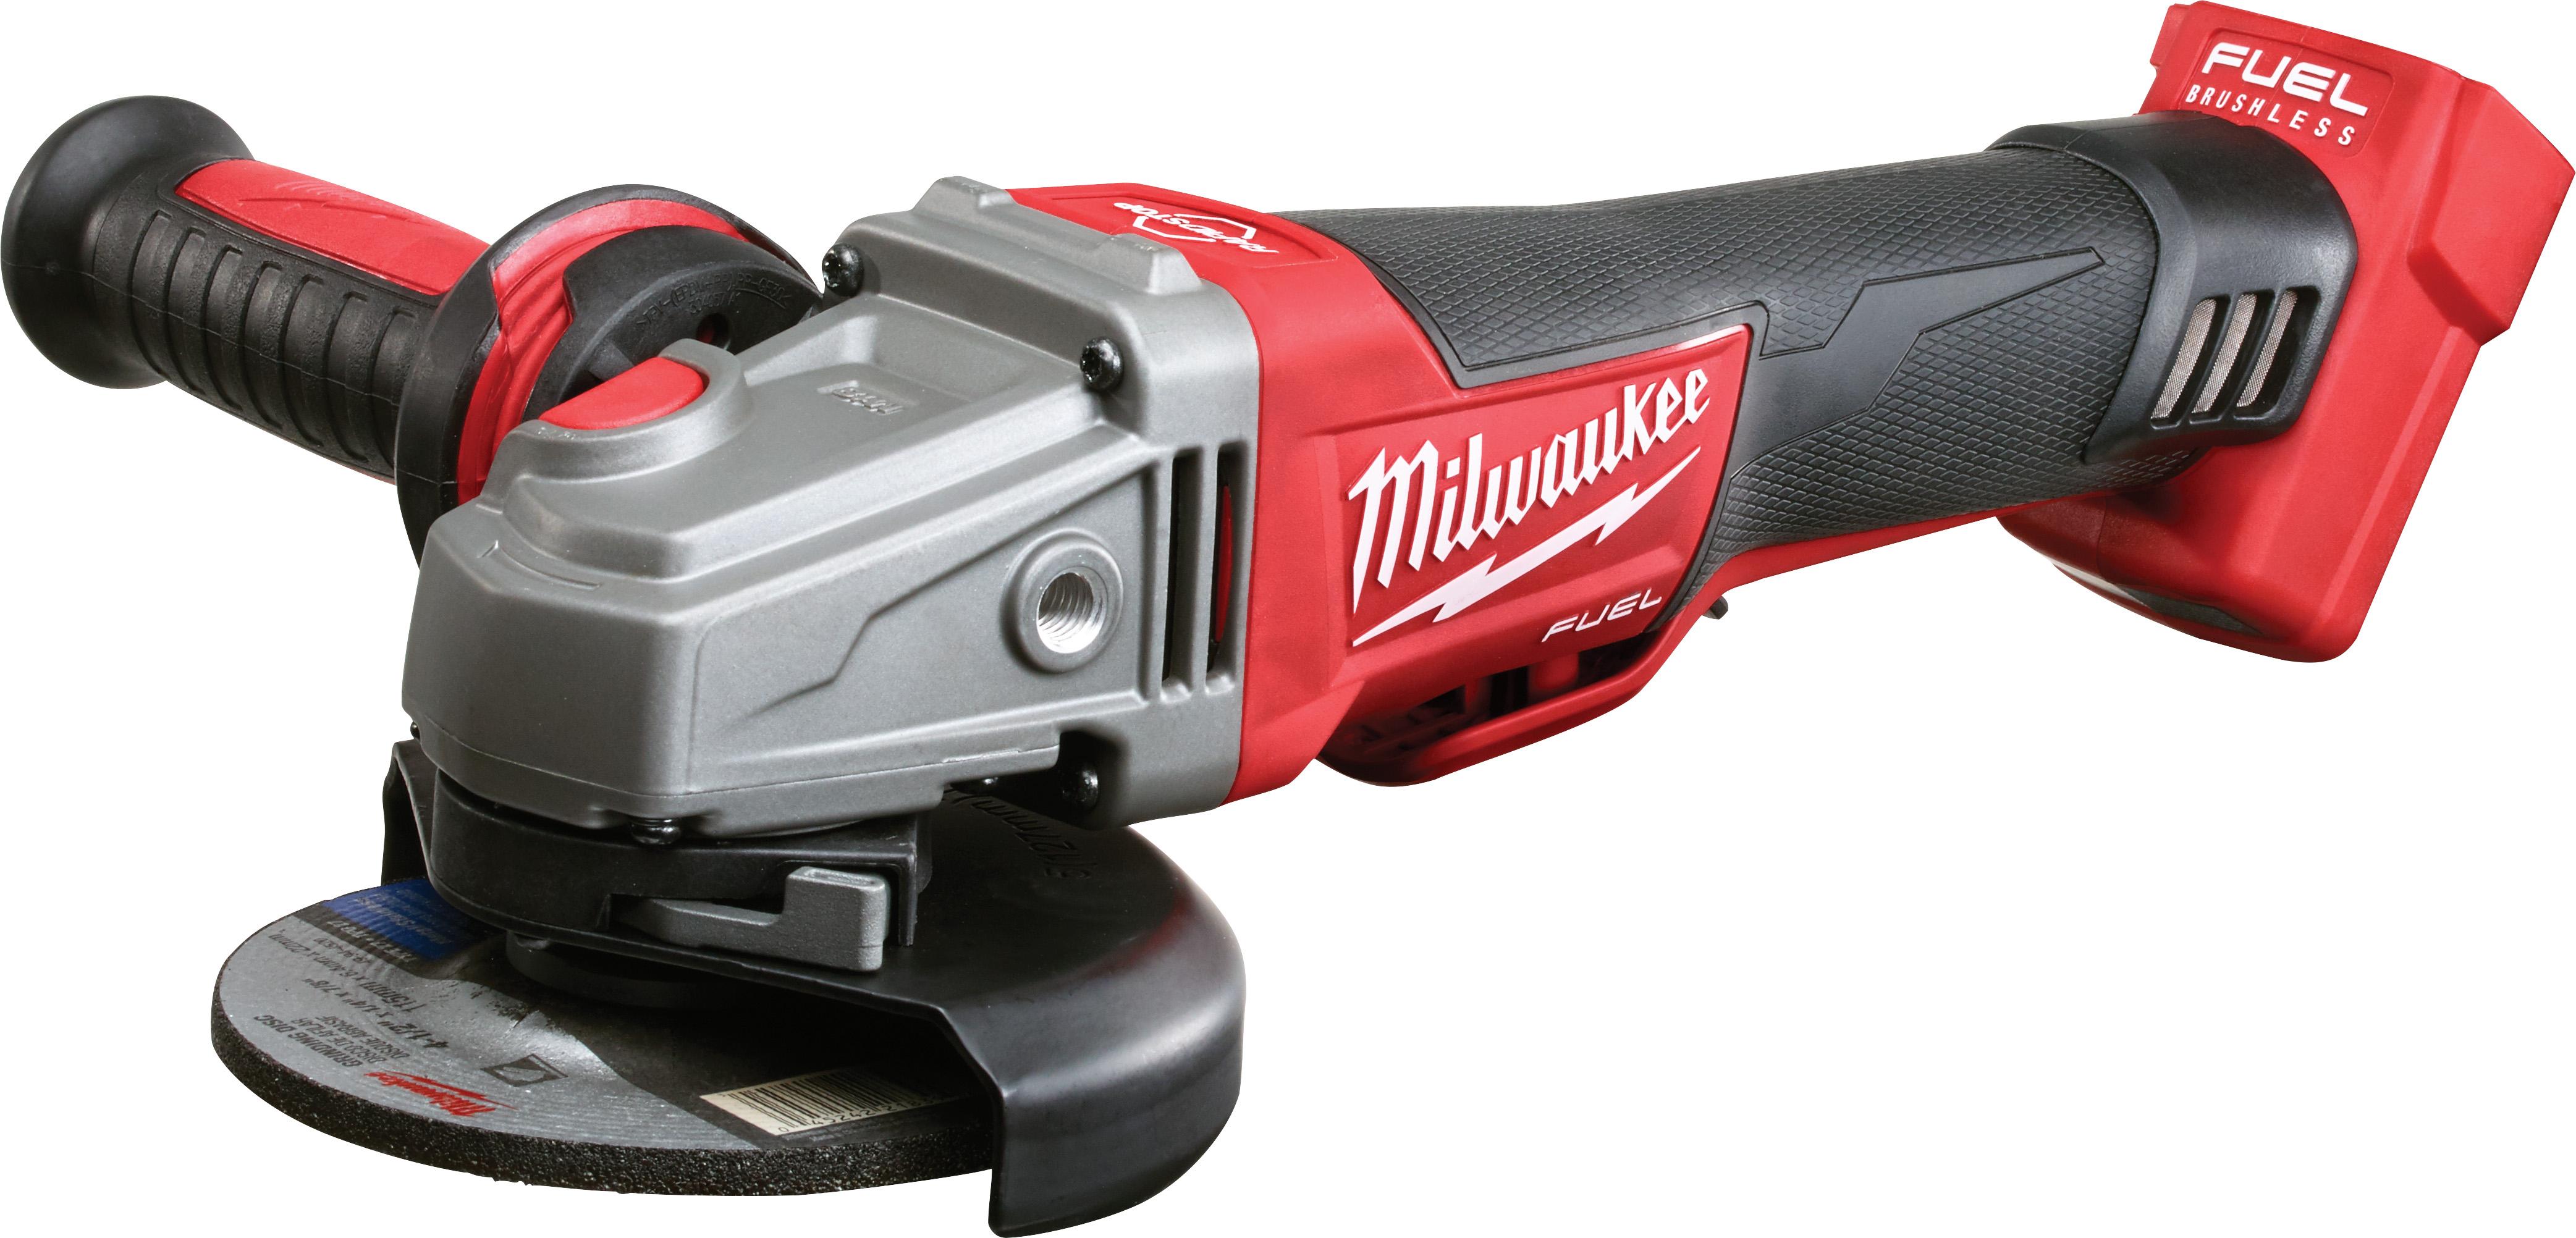 Milwaukee® M18™ FUEL™ 2783-20 Cordless Angle Braking Grinder, 5 in Dia Wheel, 5/8-11 Arbor/Shank, 18 VDC, M18™ REDLITHIUM™ Battery, Paddle No-Lock Switch